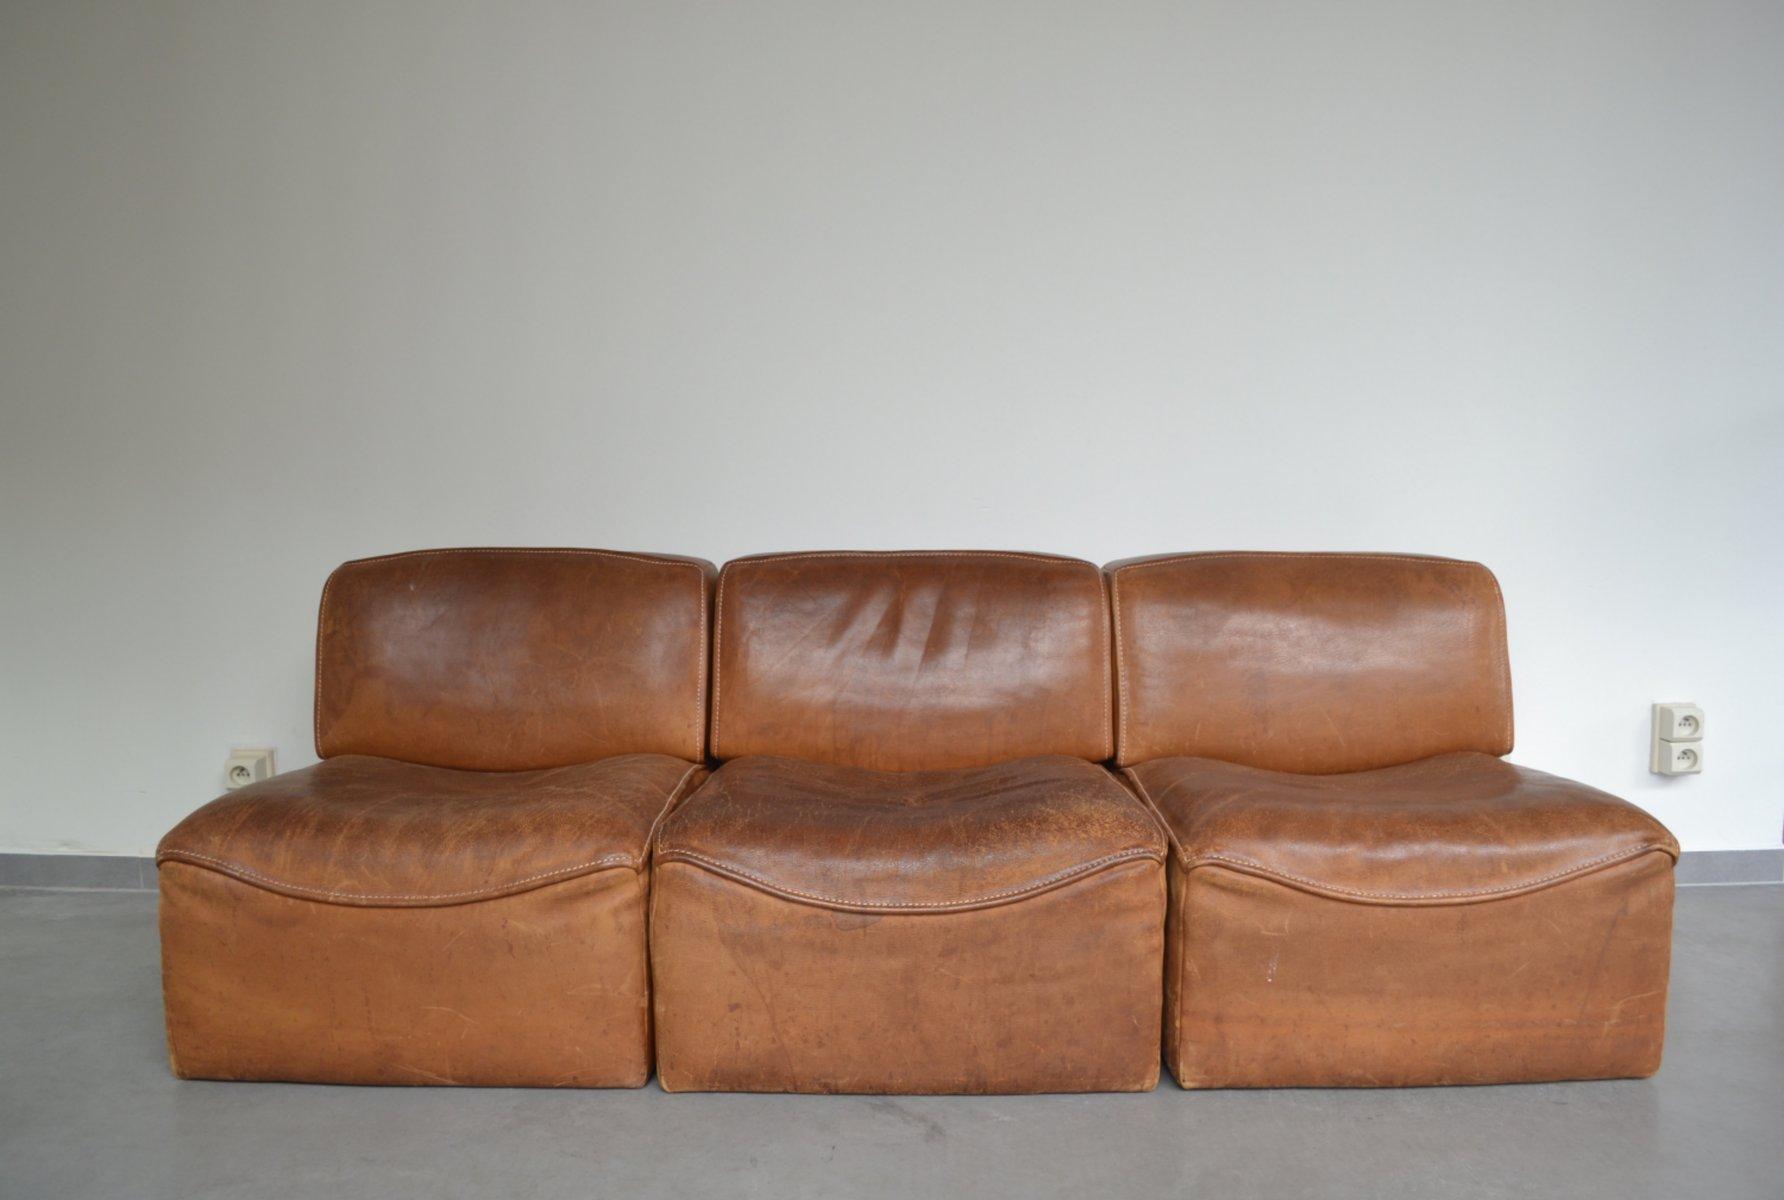 modulares ds15 sofa von de sede 1970er bei pamono kaufen. Black Bedroom Furniture Sets. Home Design Ideas